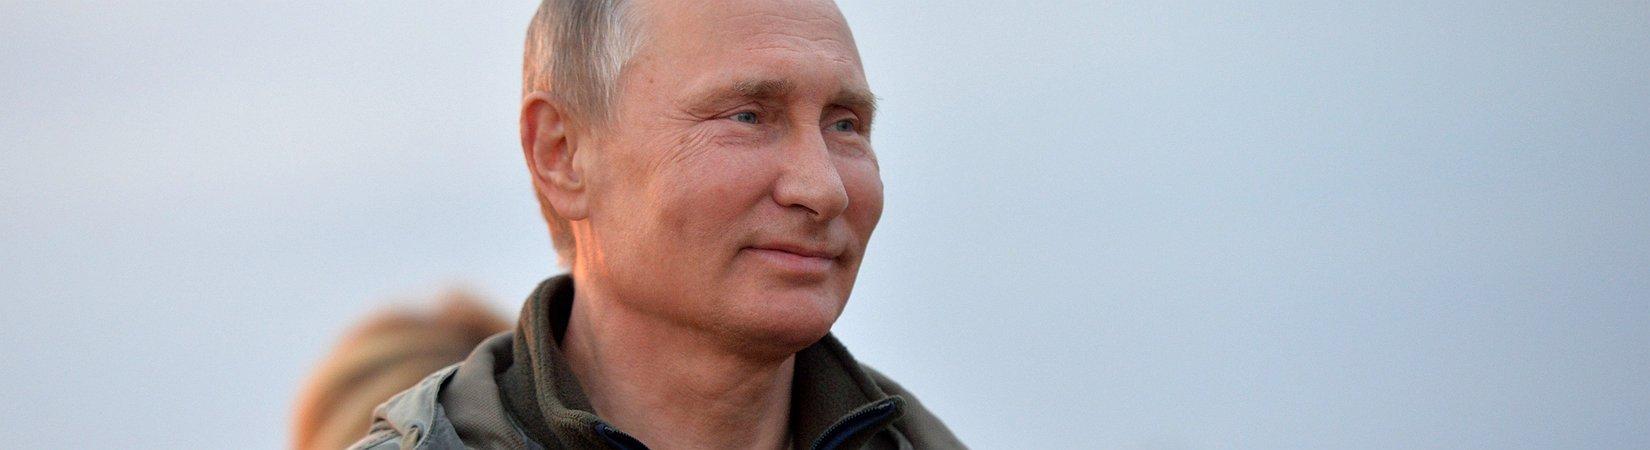 Putin suspende un acuerdo nuclear con Washington